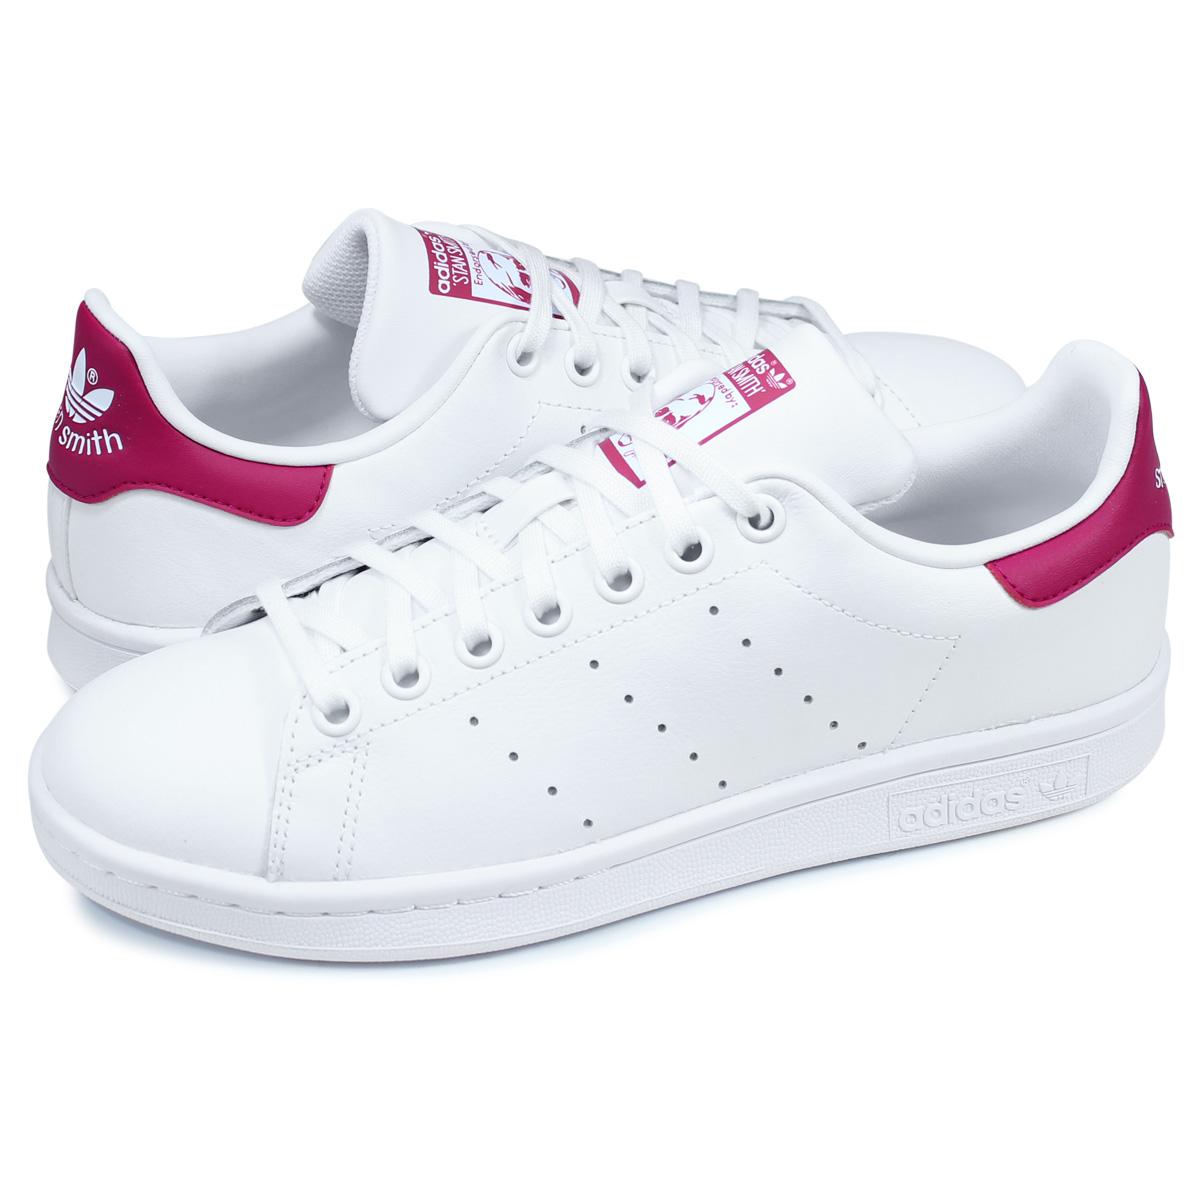 size 40 b75a6 c7f45 adidas Originals STAN SMITH J Adidas originals Stan Smith sneakers Lady's  white white B32703 [8/16 reentry load] [198]